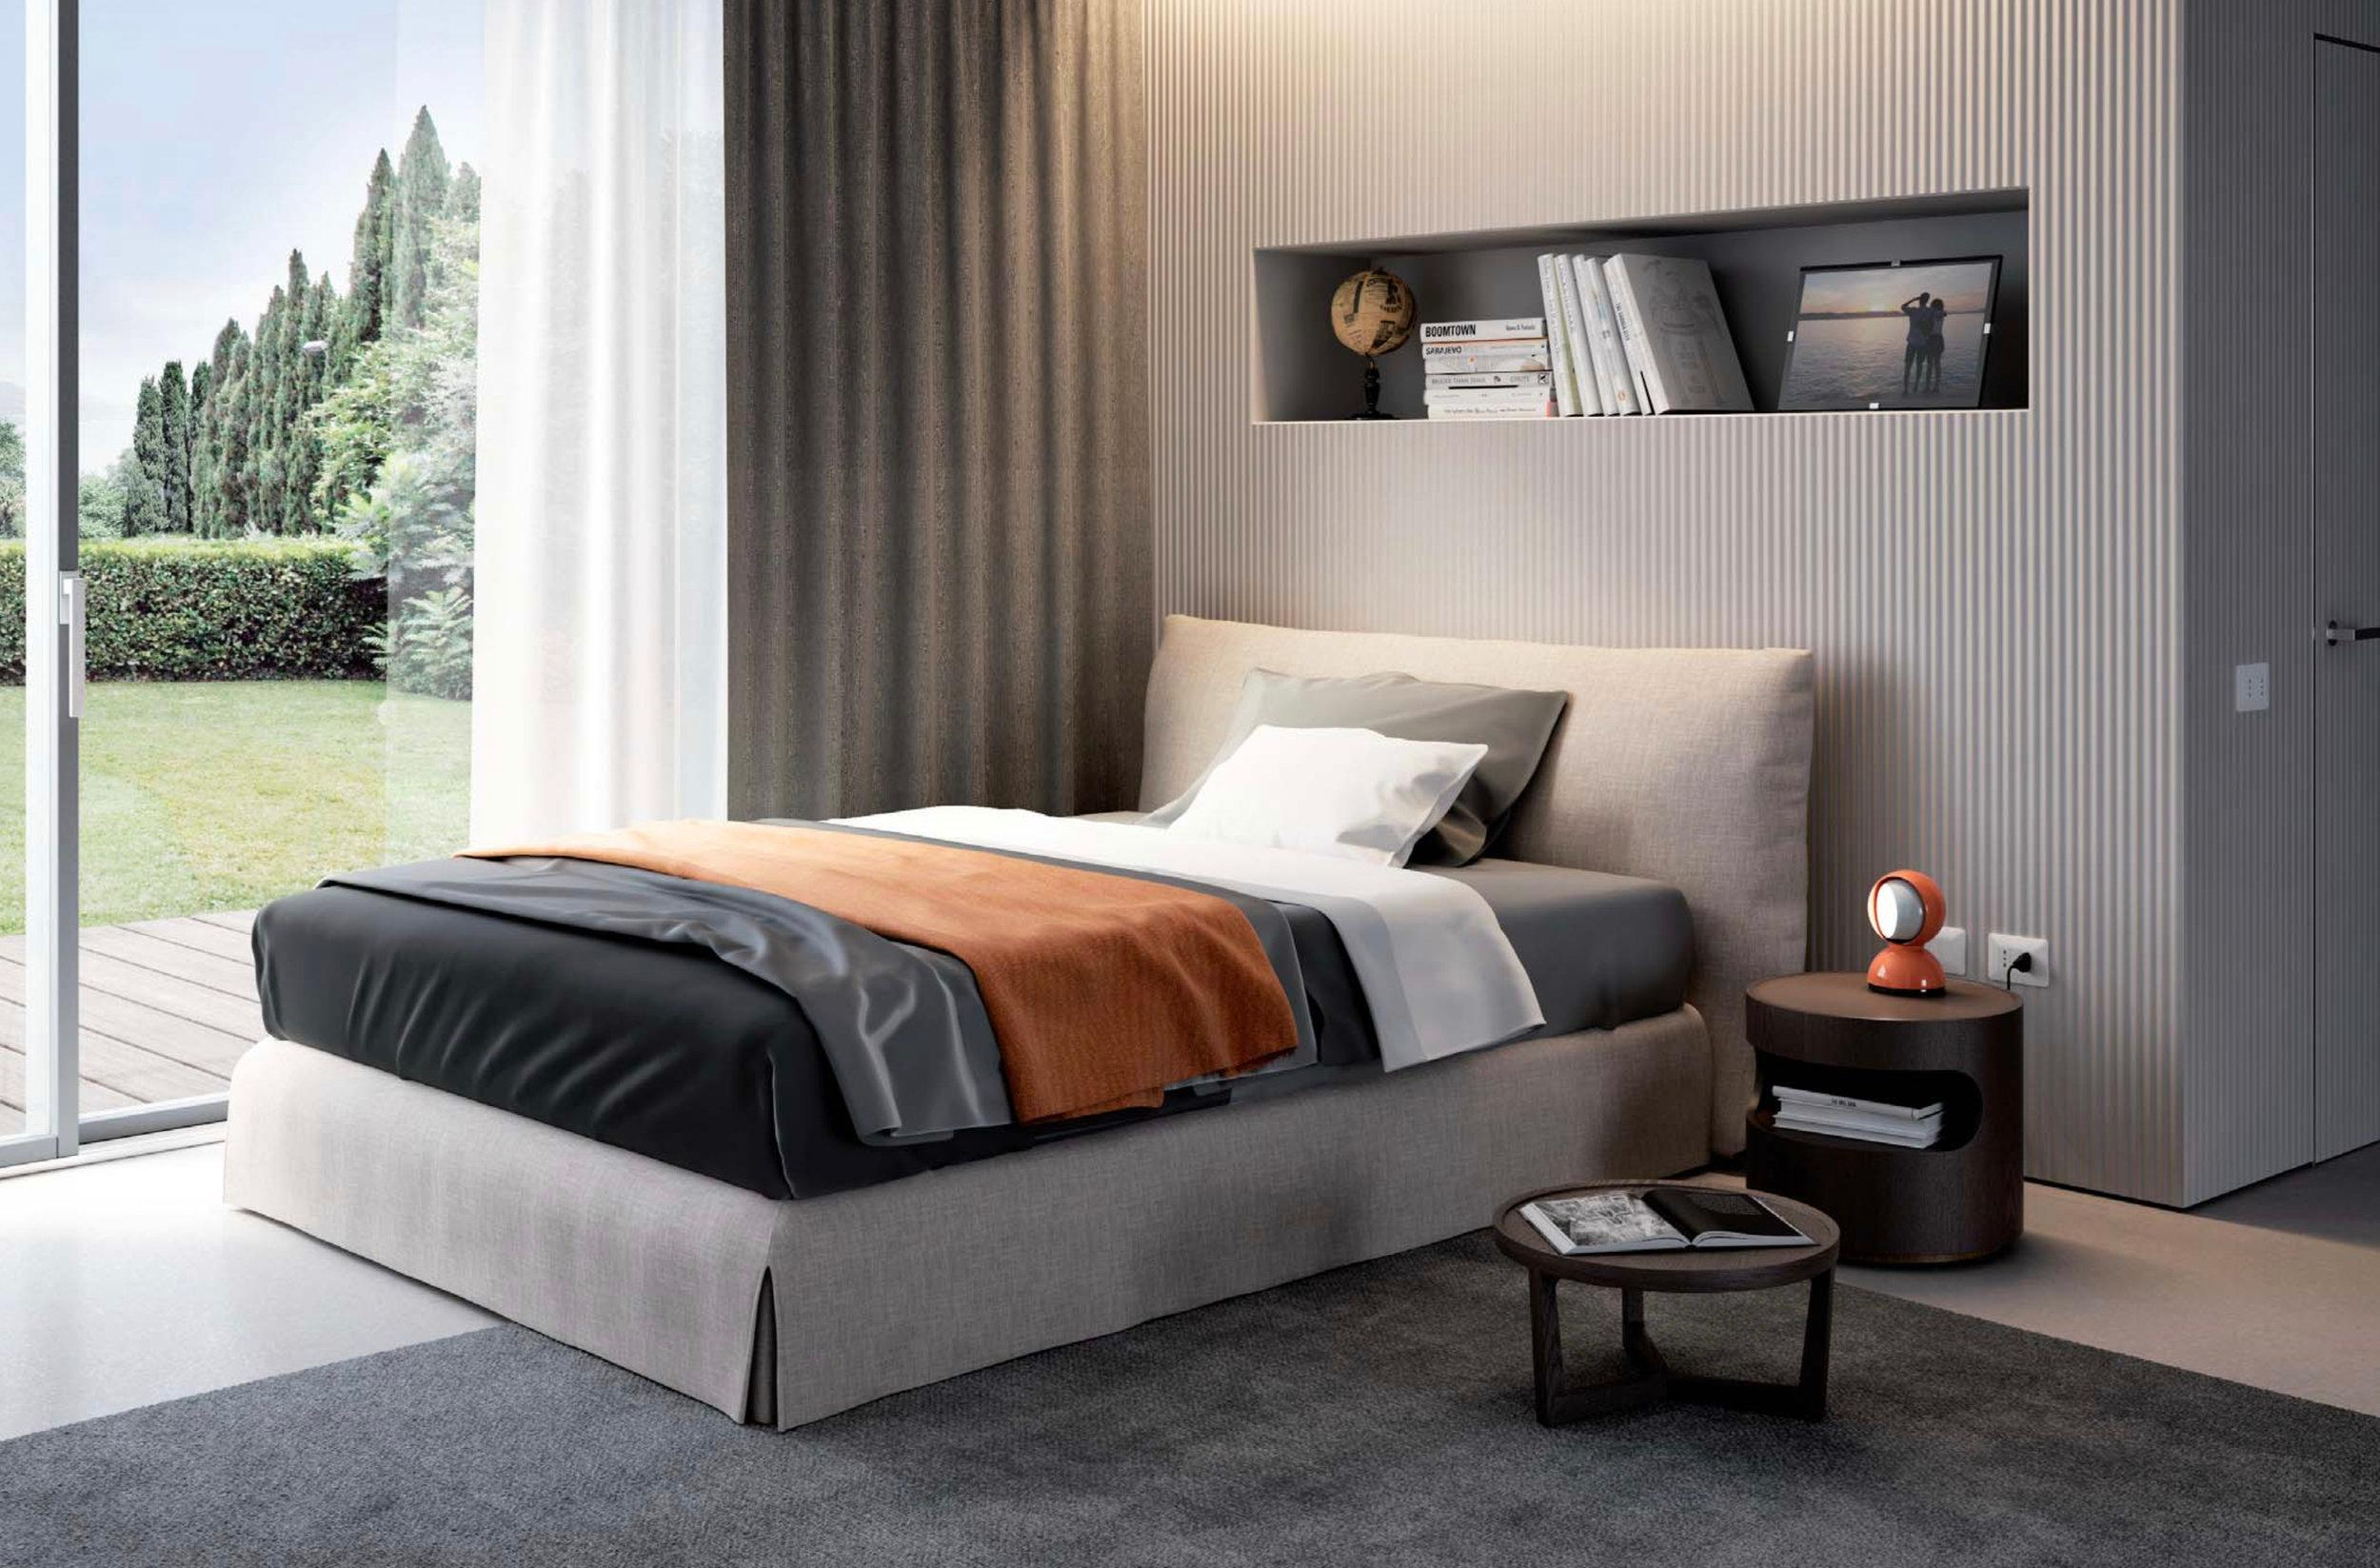 Italian Modern Clouds Bed, Italy, New, Fabric, Italian Bedroom